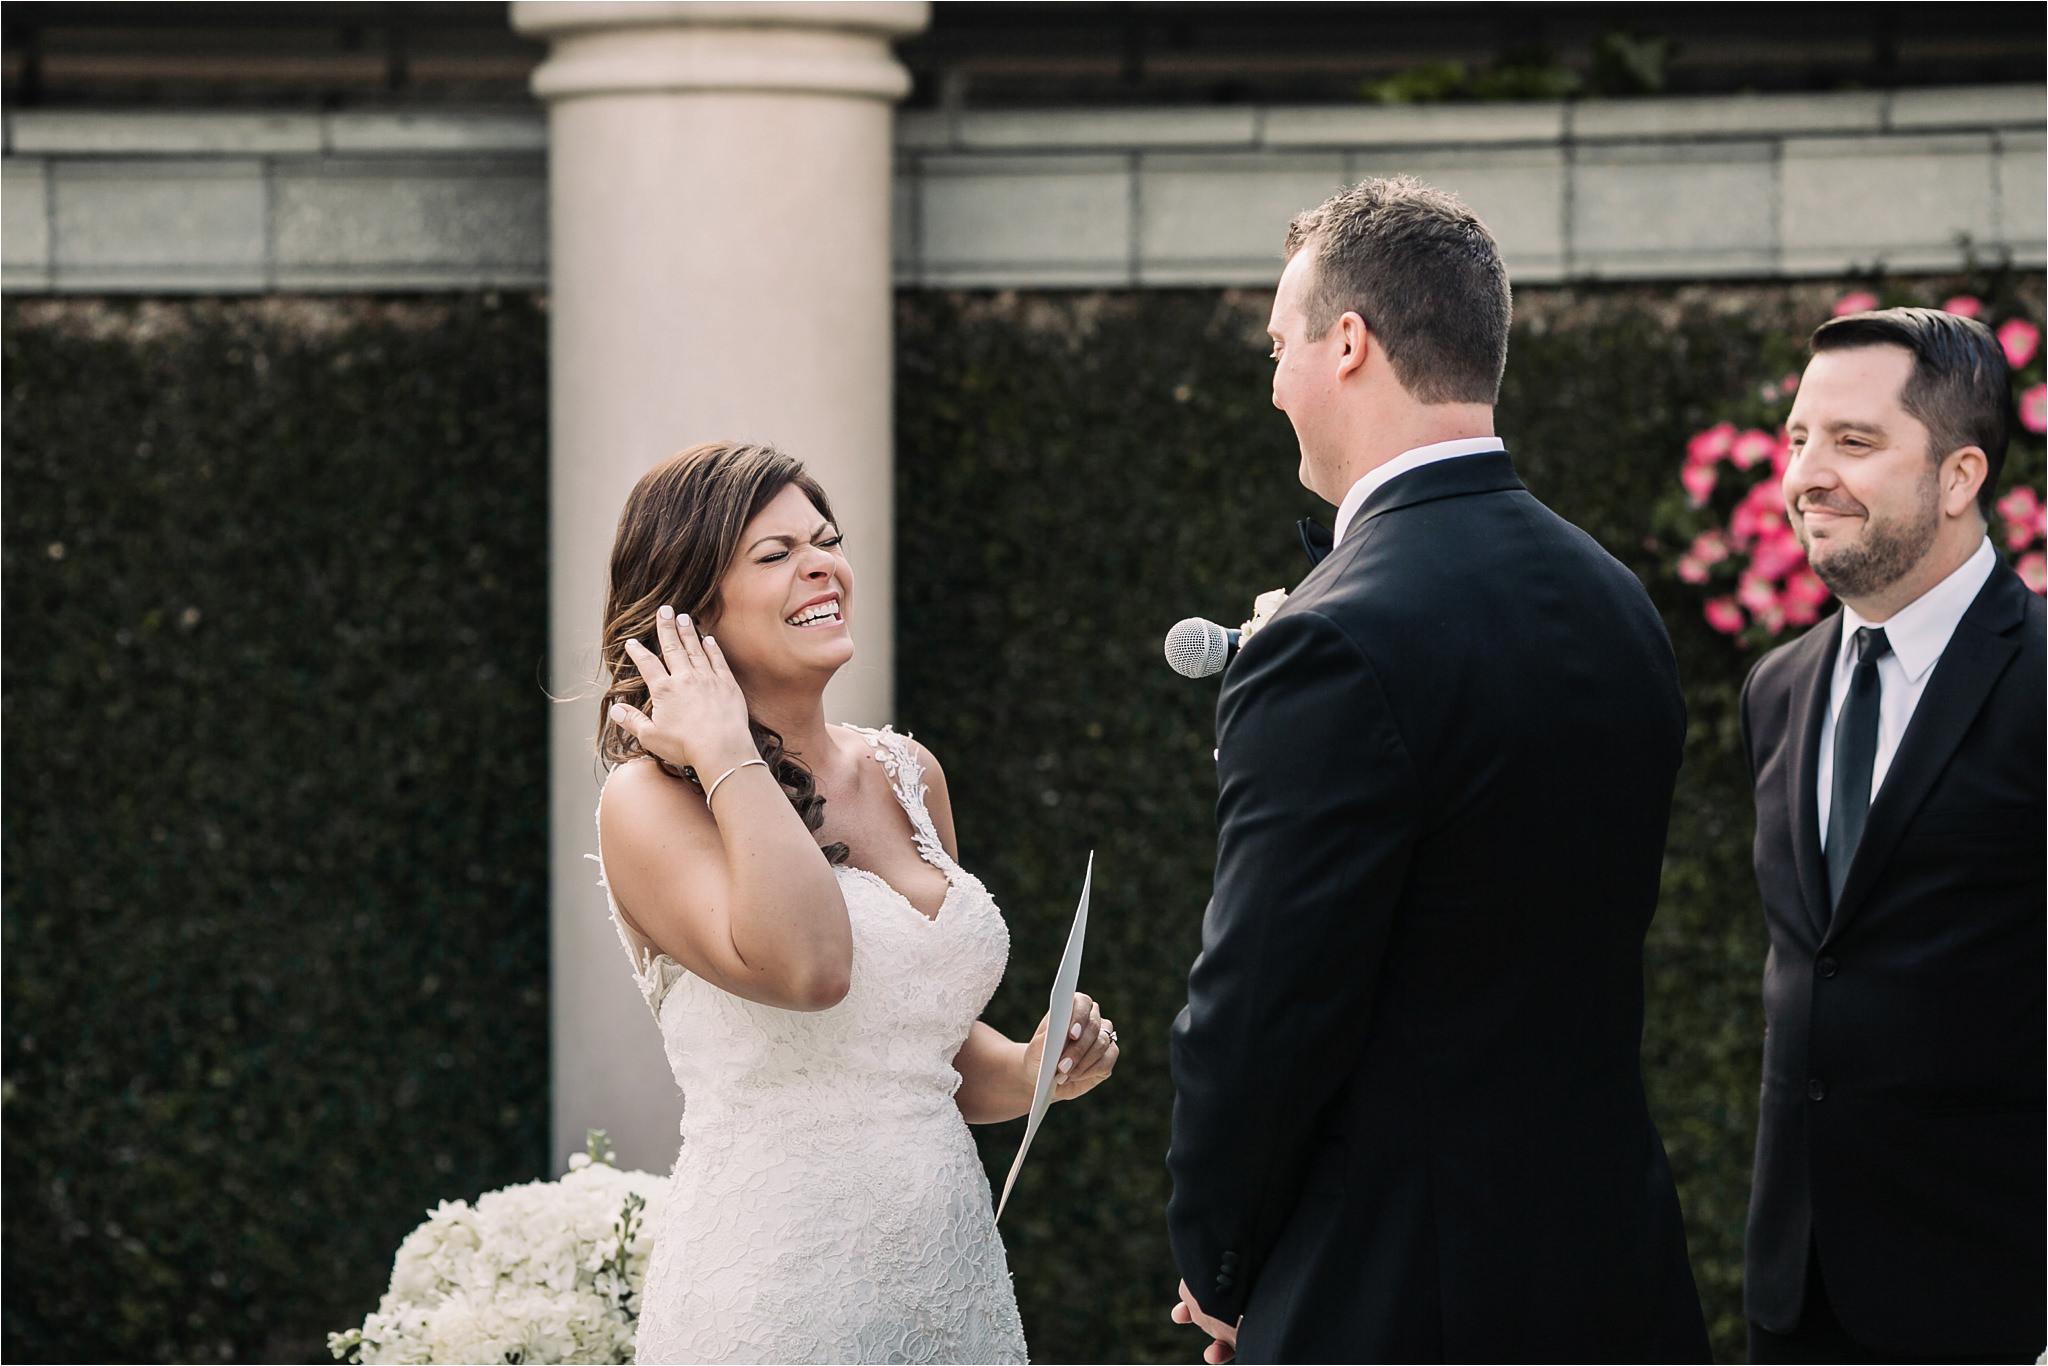 jessica-roman-photography-arden hills wedding photograpger-sacramento-boise-25.jpg